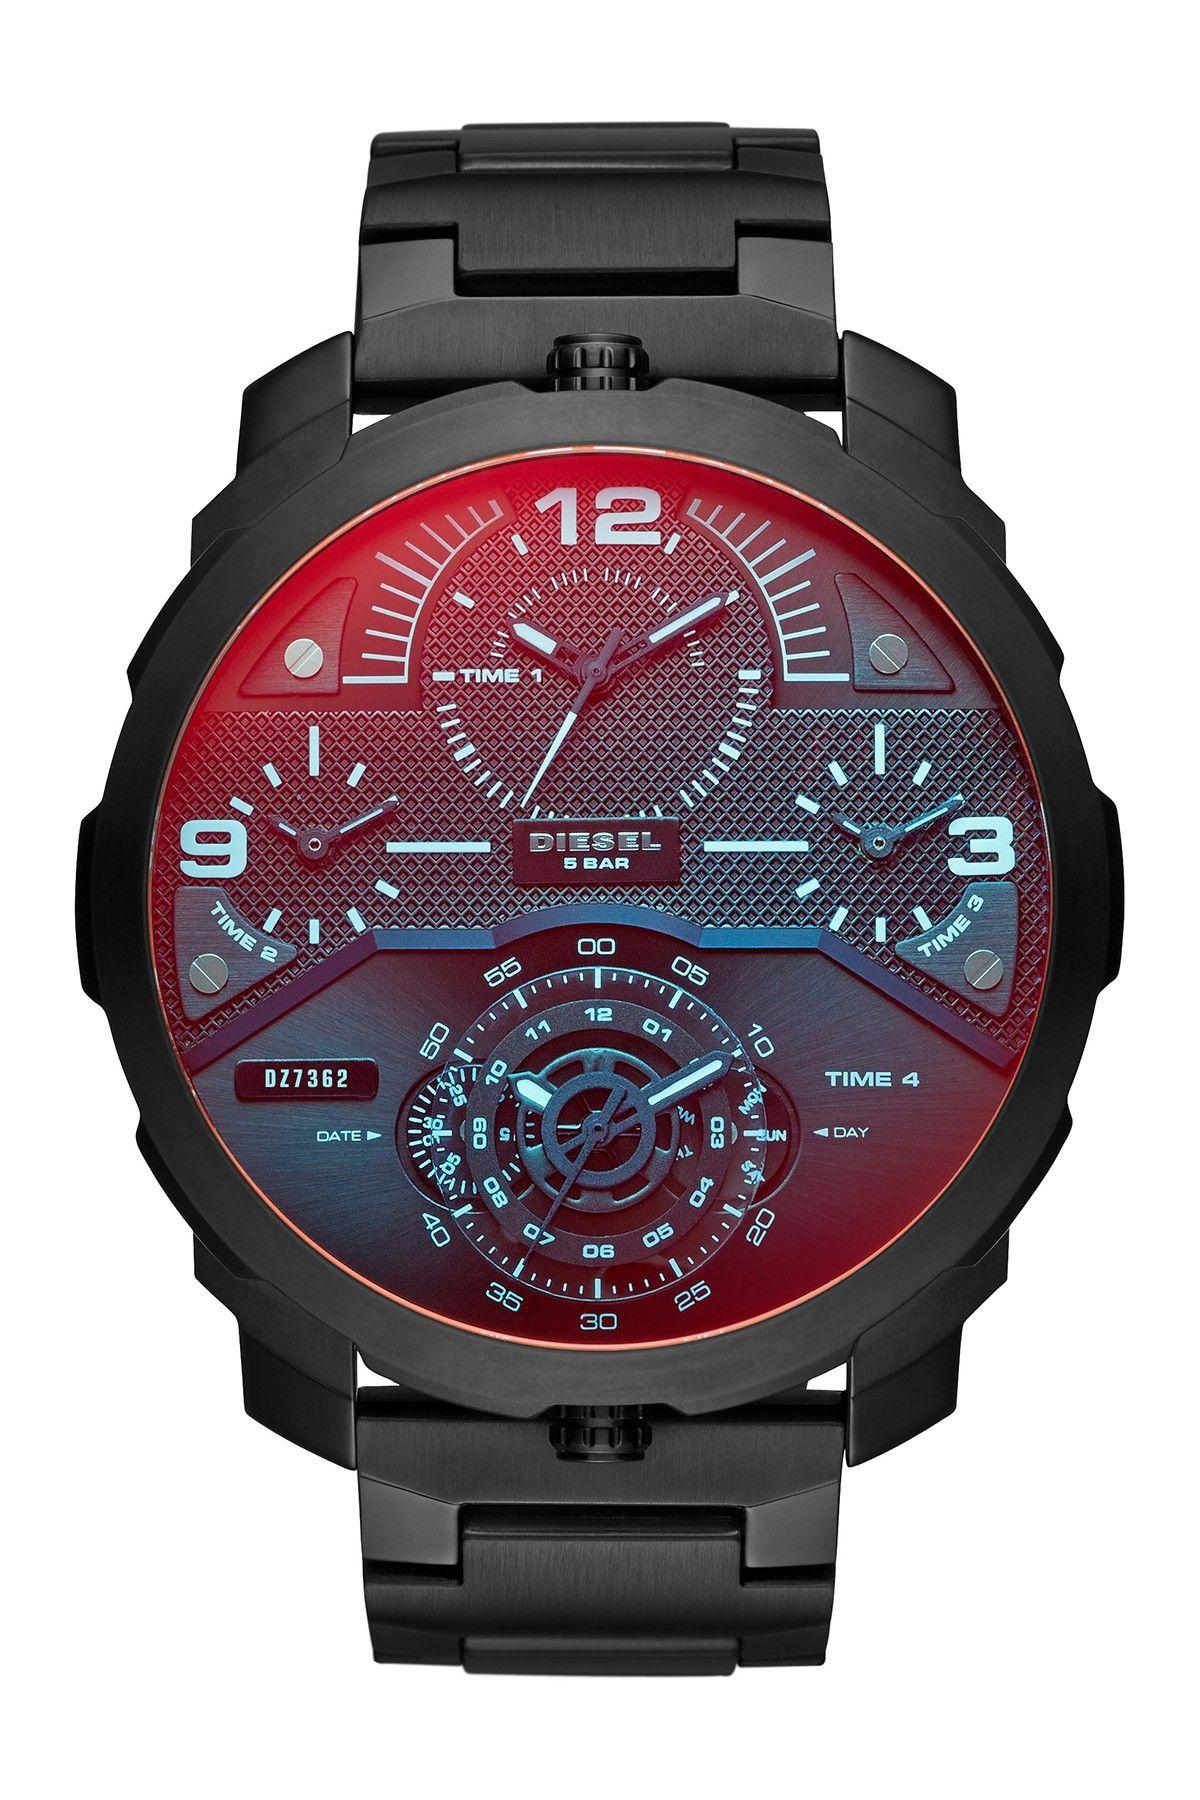 Diesel Men's Large Round Watch Diesel watch, Diesel